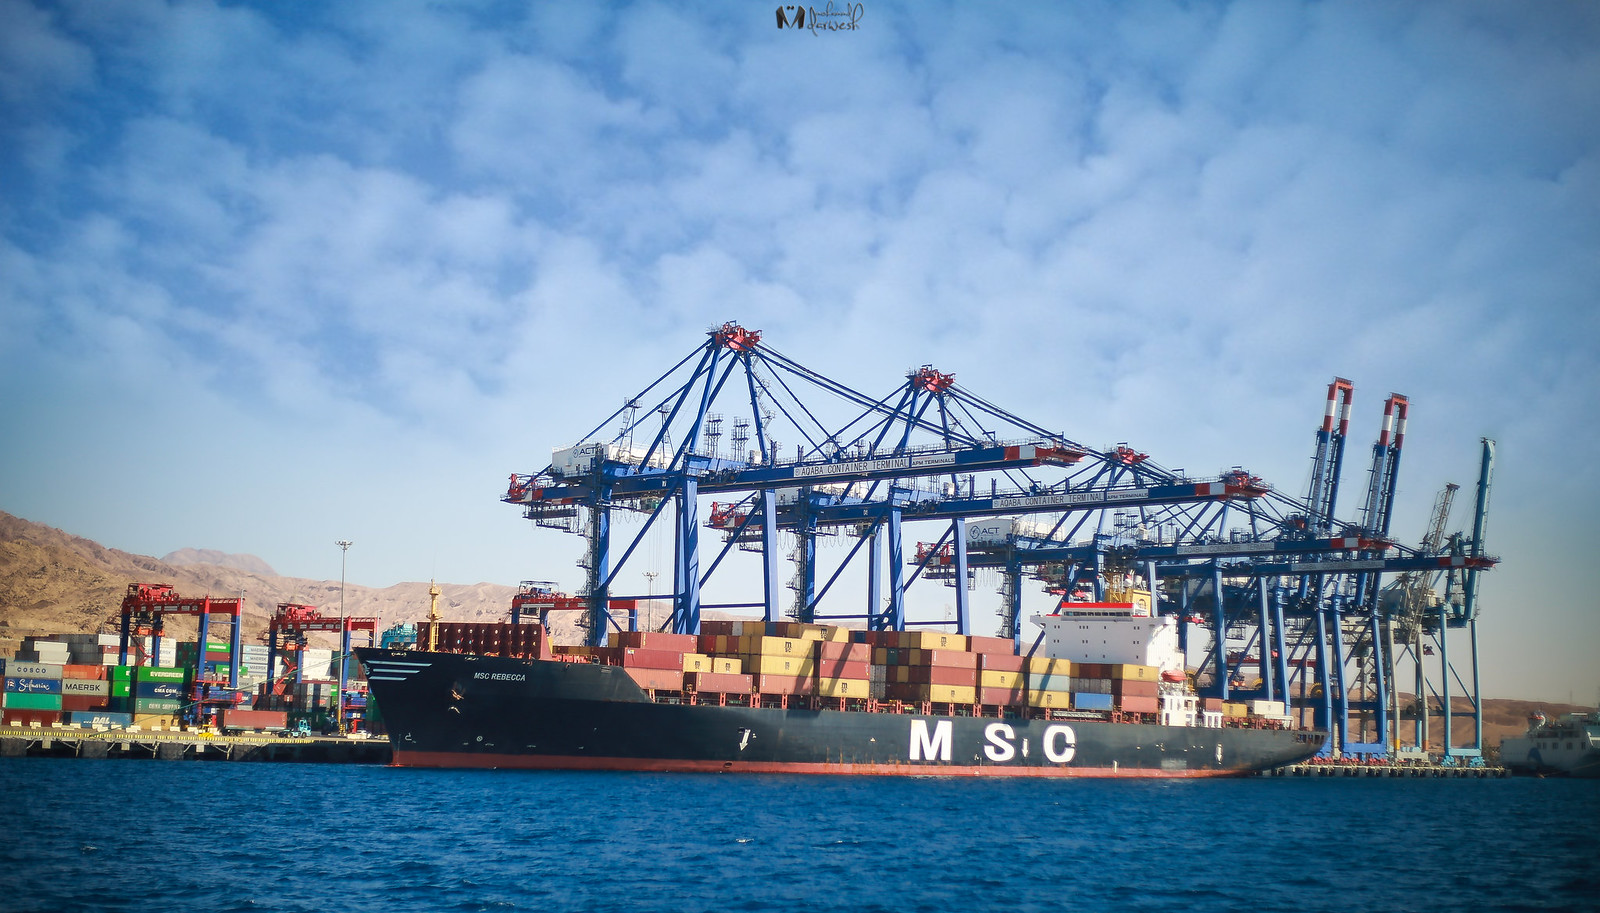 Aqaba Container Terminal, Jordan | Flickr